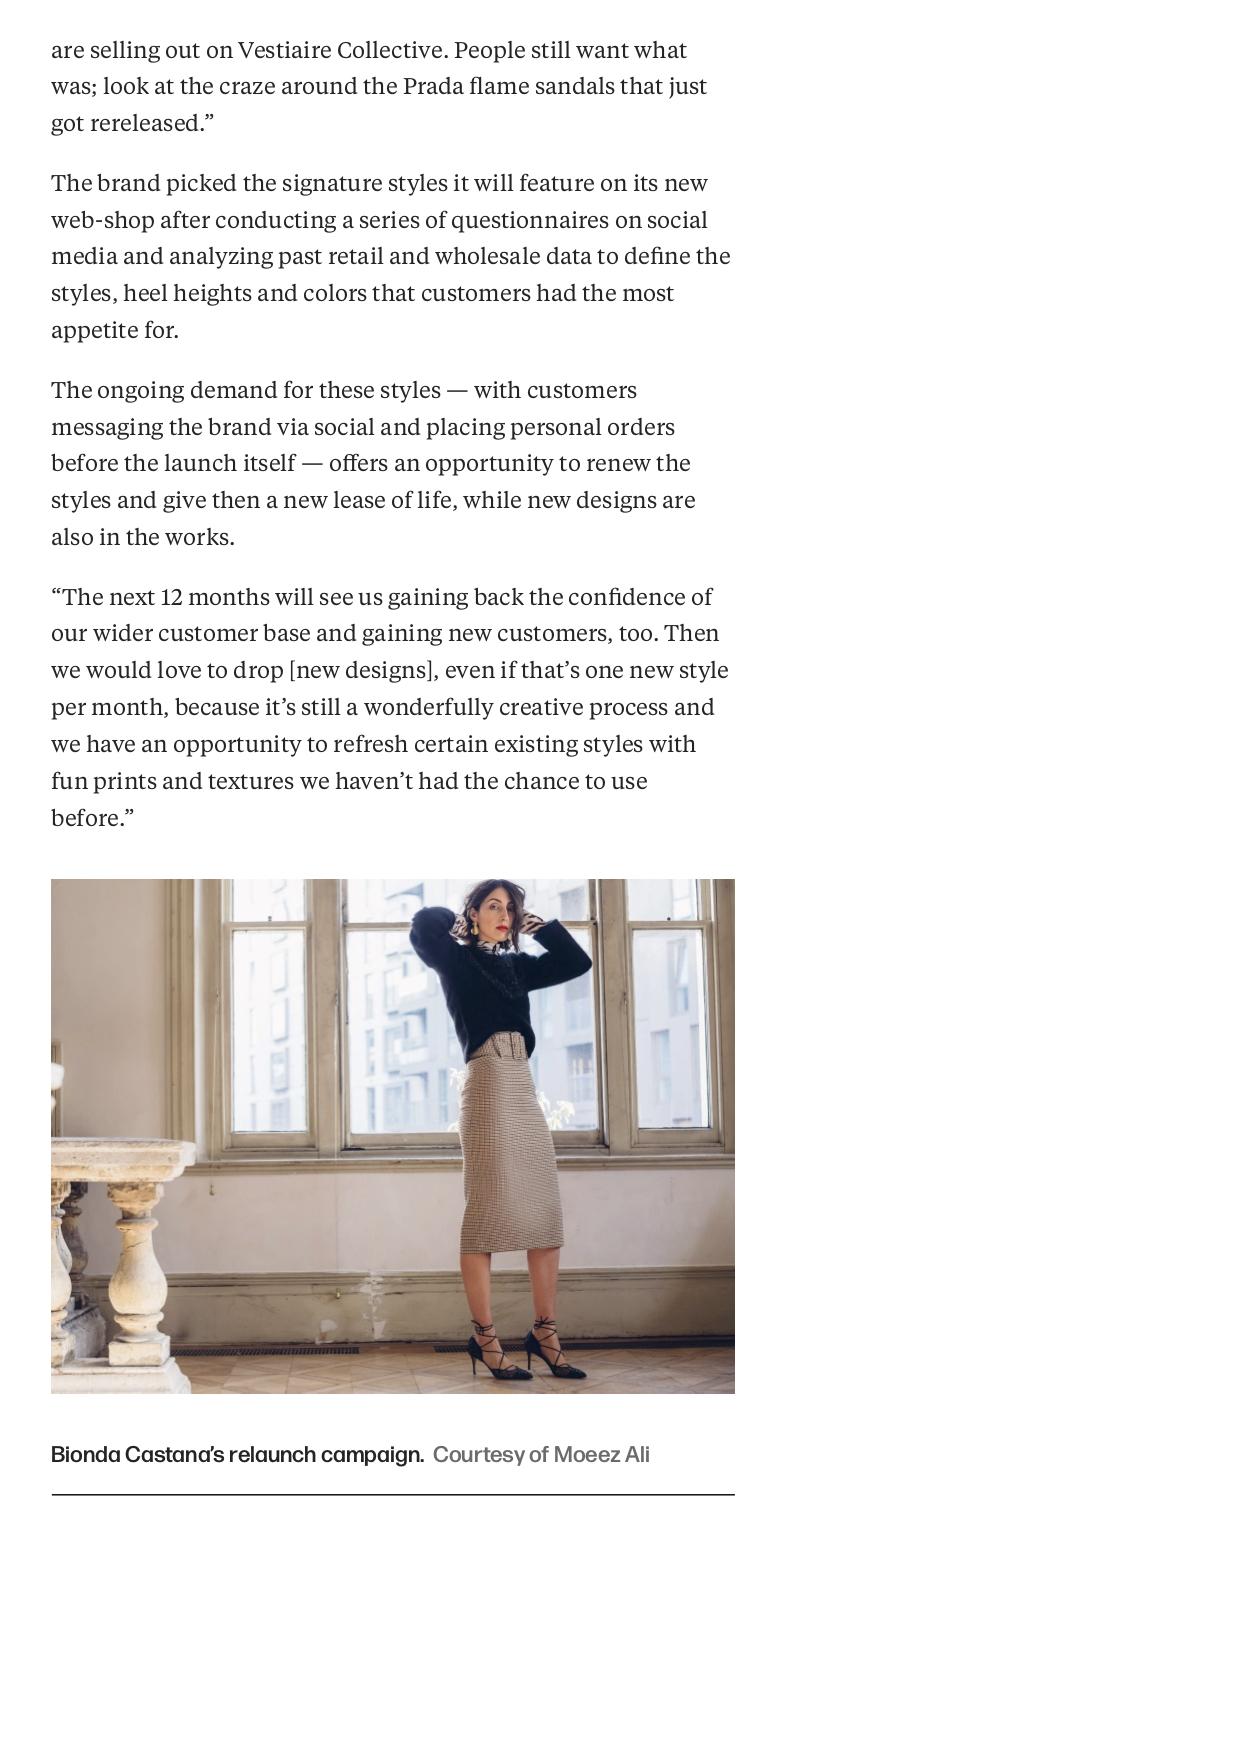 Bionda Castana Returns With Renewed Vision – WWD - 5.jpg